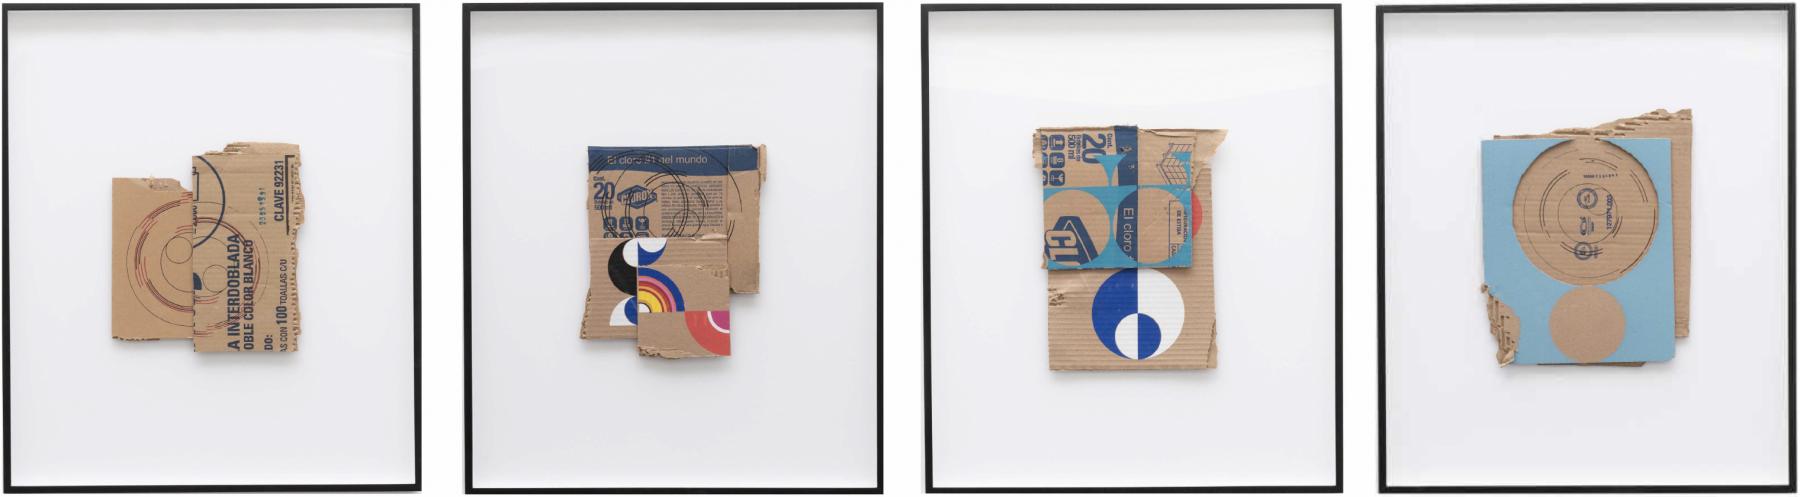 4 cardboards